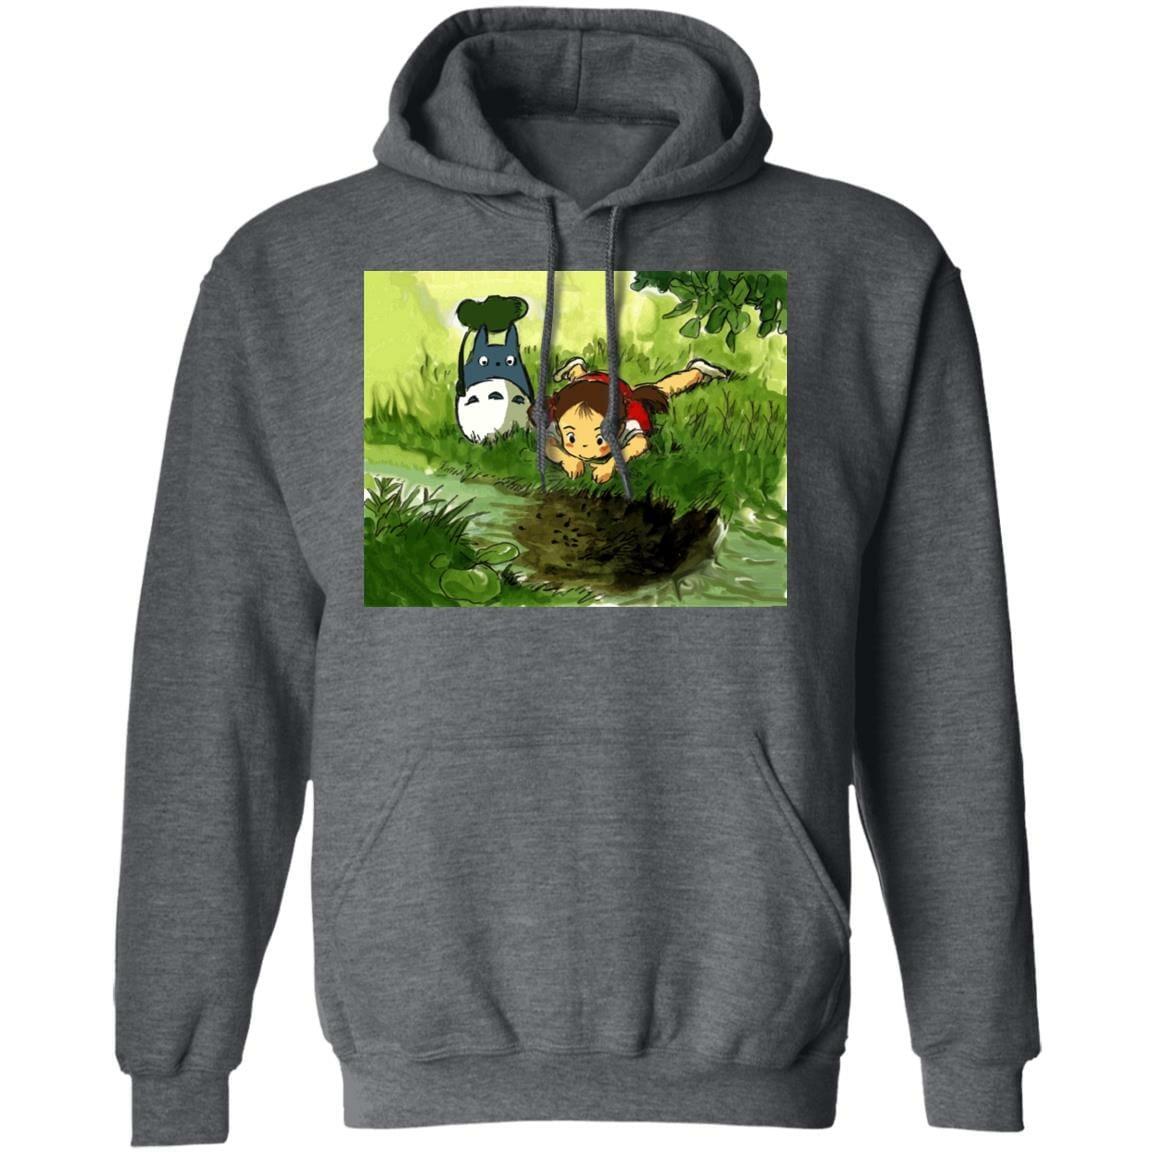 My Neighbor Totoro – Playing Mei Hoodie Unisex